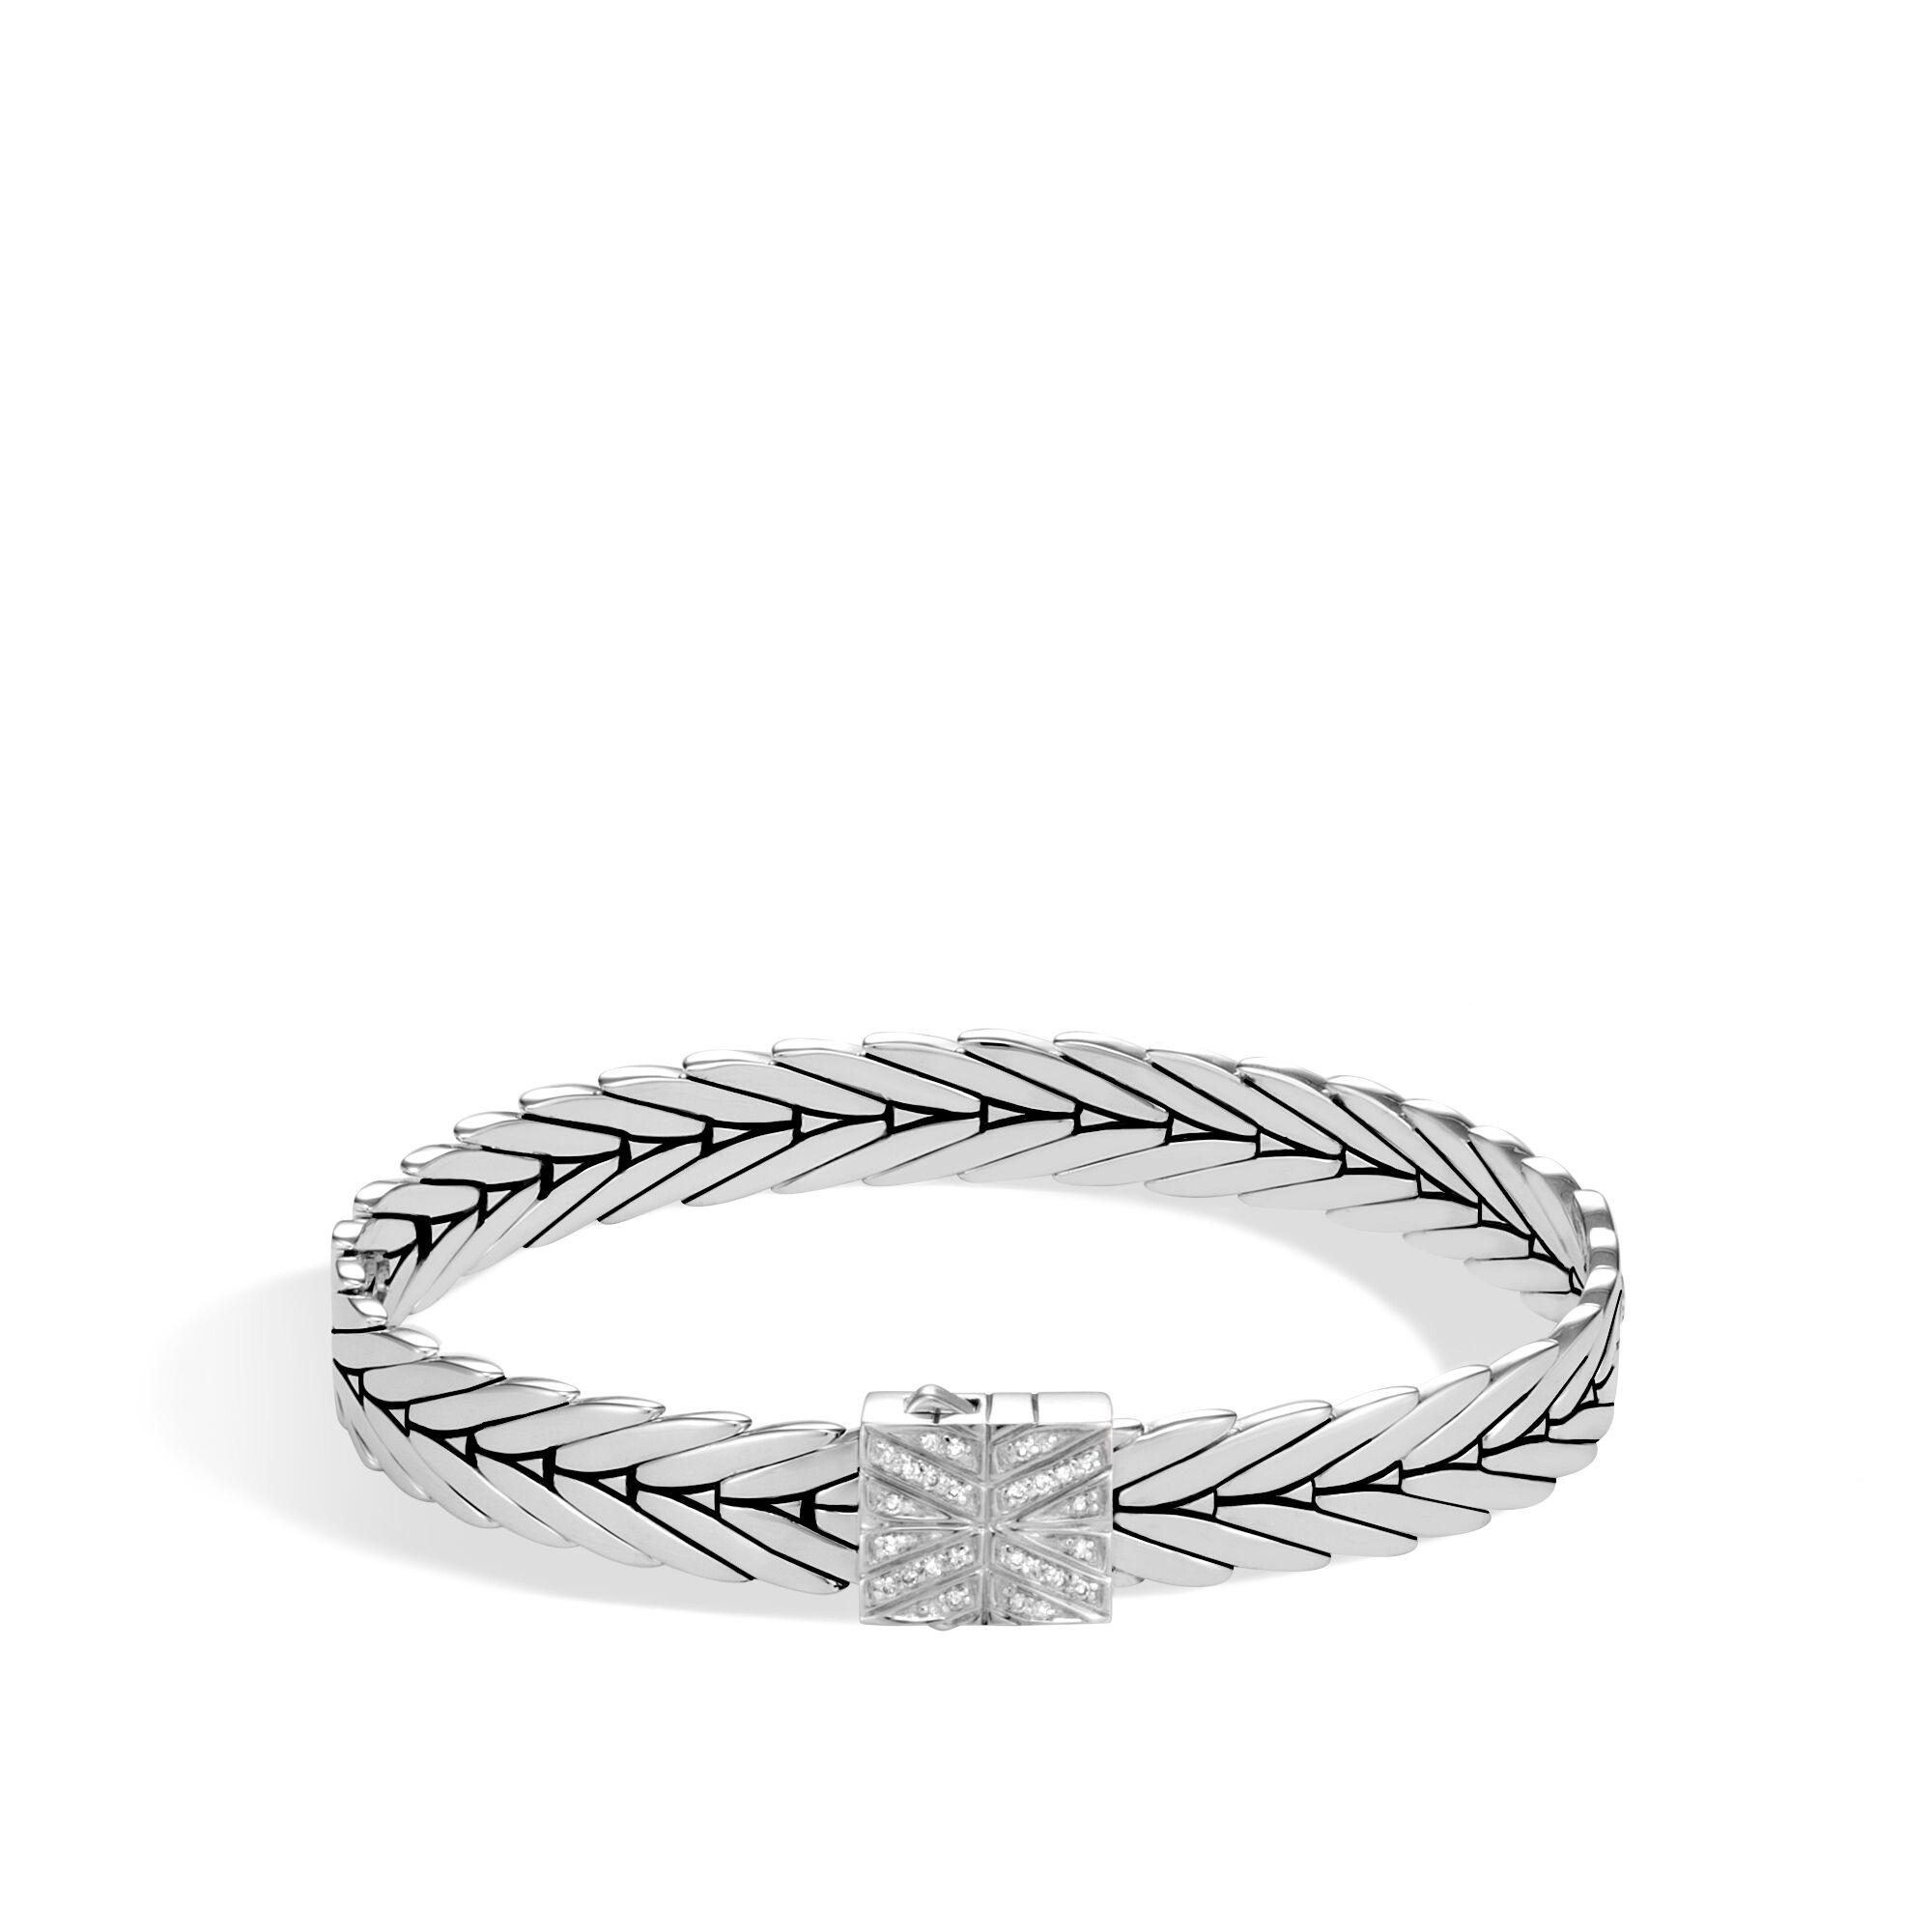 John Hardy Modern Chain Bracelet With Diamonds Xl White diamond m8DYbl4T9